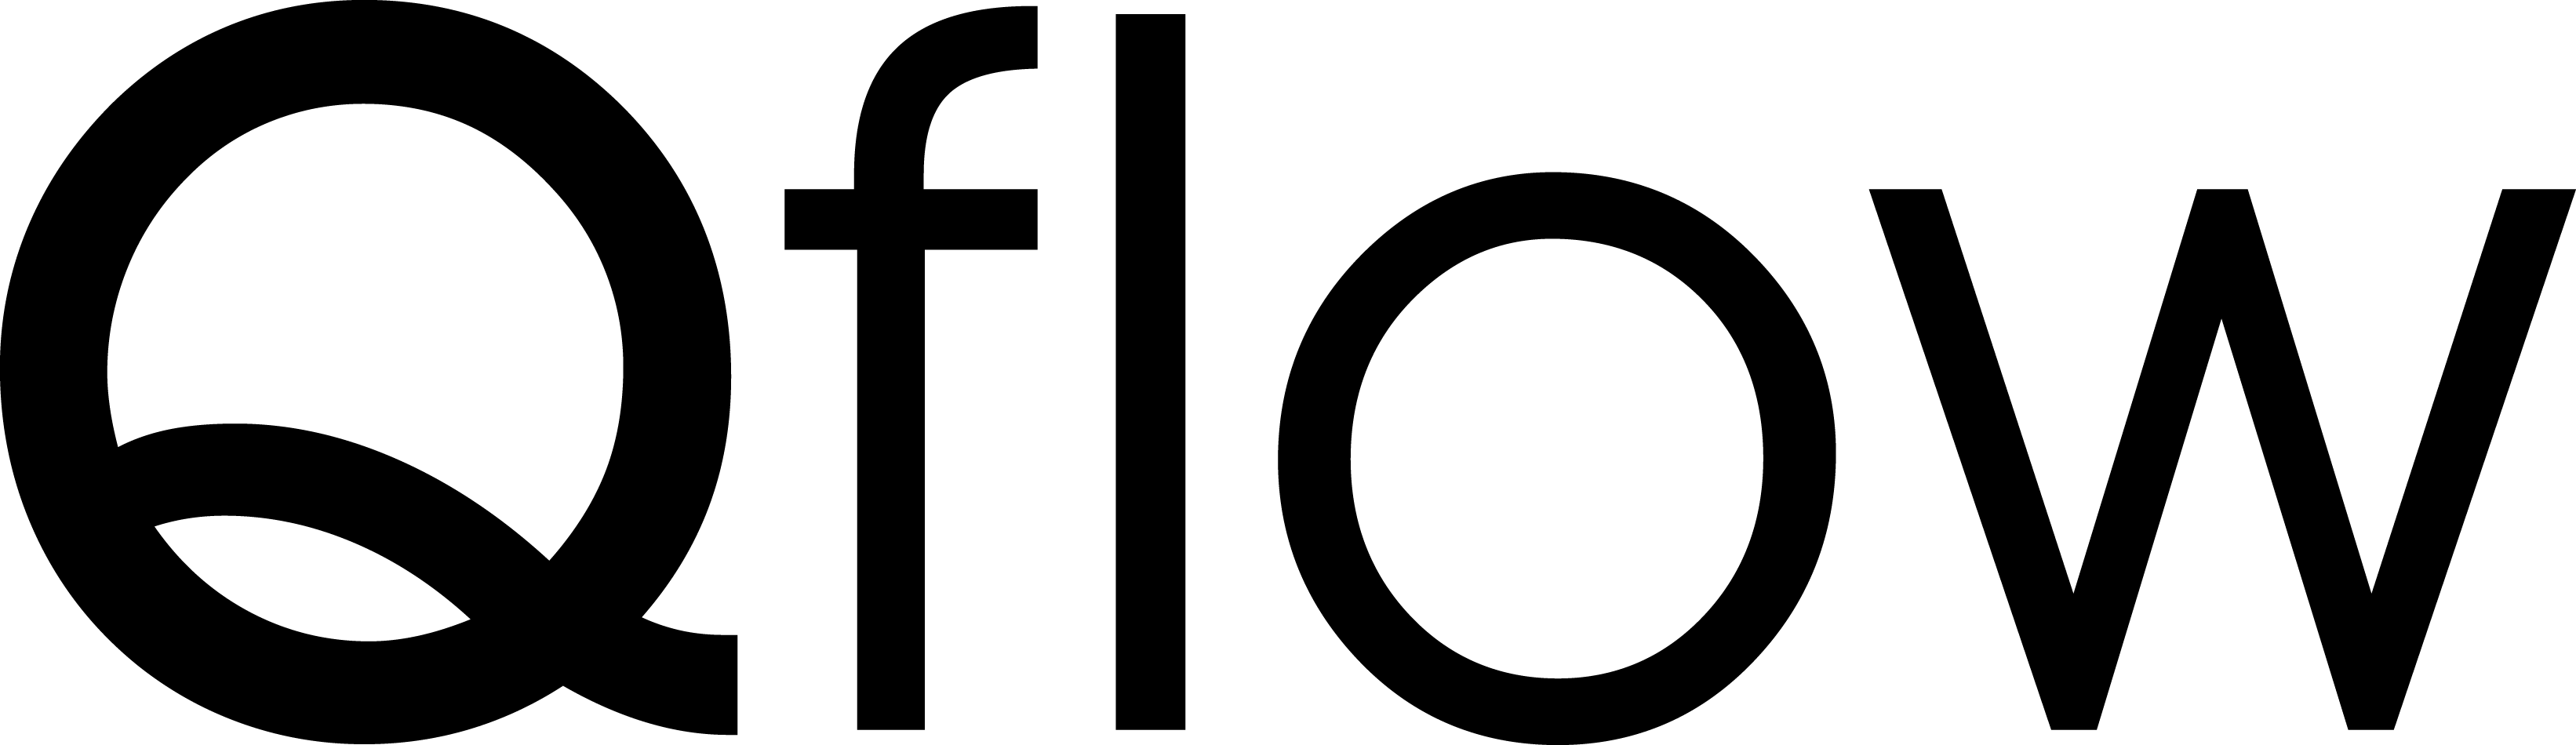 https://www.datocms-assets.com/46385/1632928333-qualisflow-logo-black.png